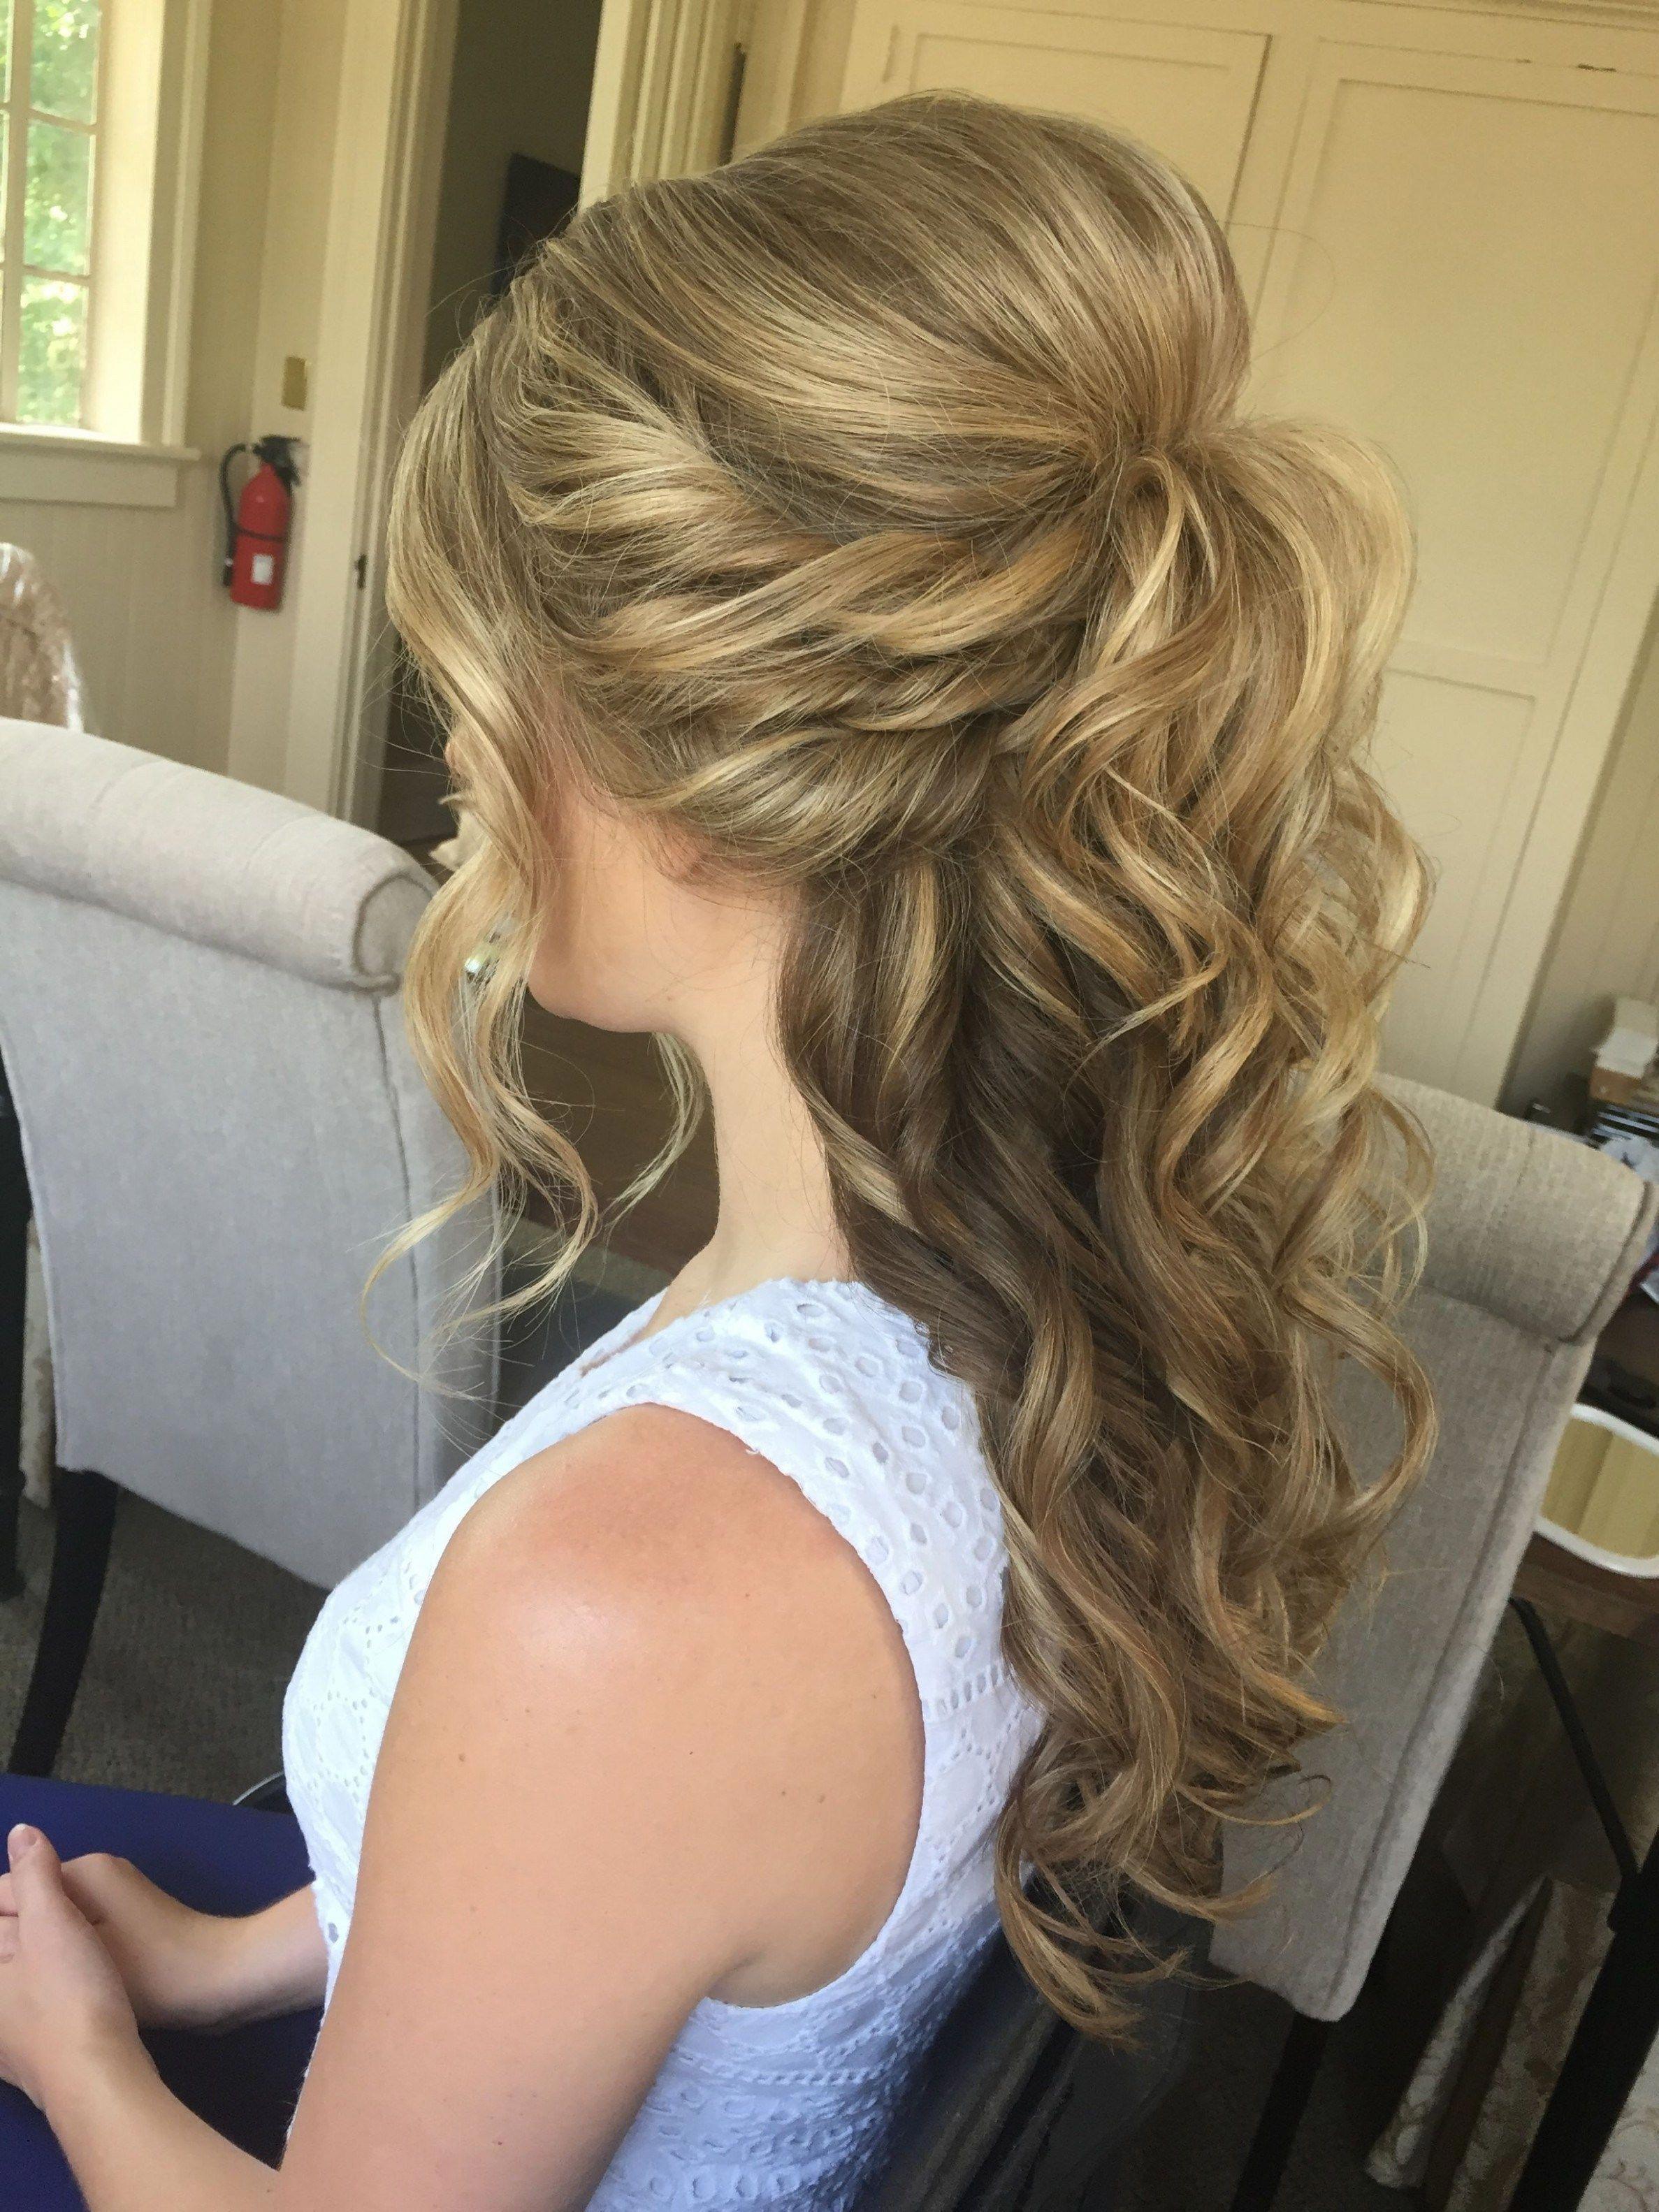 Wedding Hairstyles For Shoulder Length Hair Weddinghairstyles Hair Styles Medium Length Hair Styles Wedding Hair Half